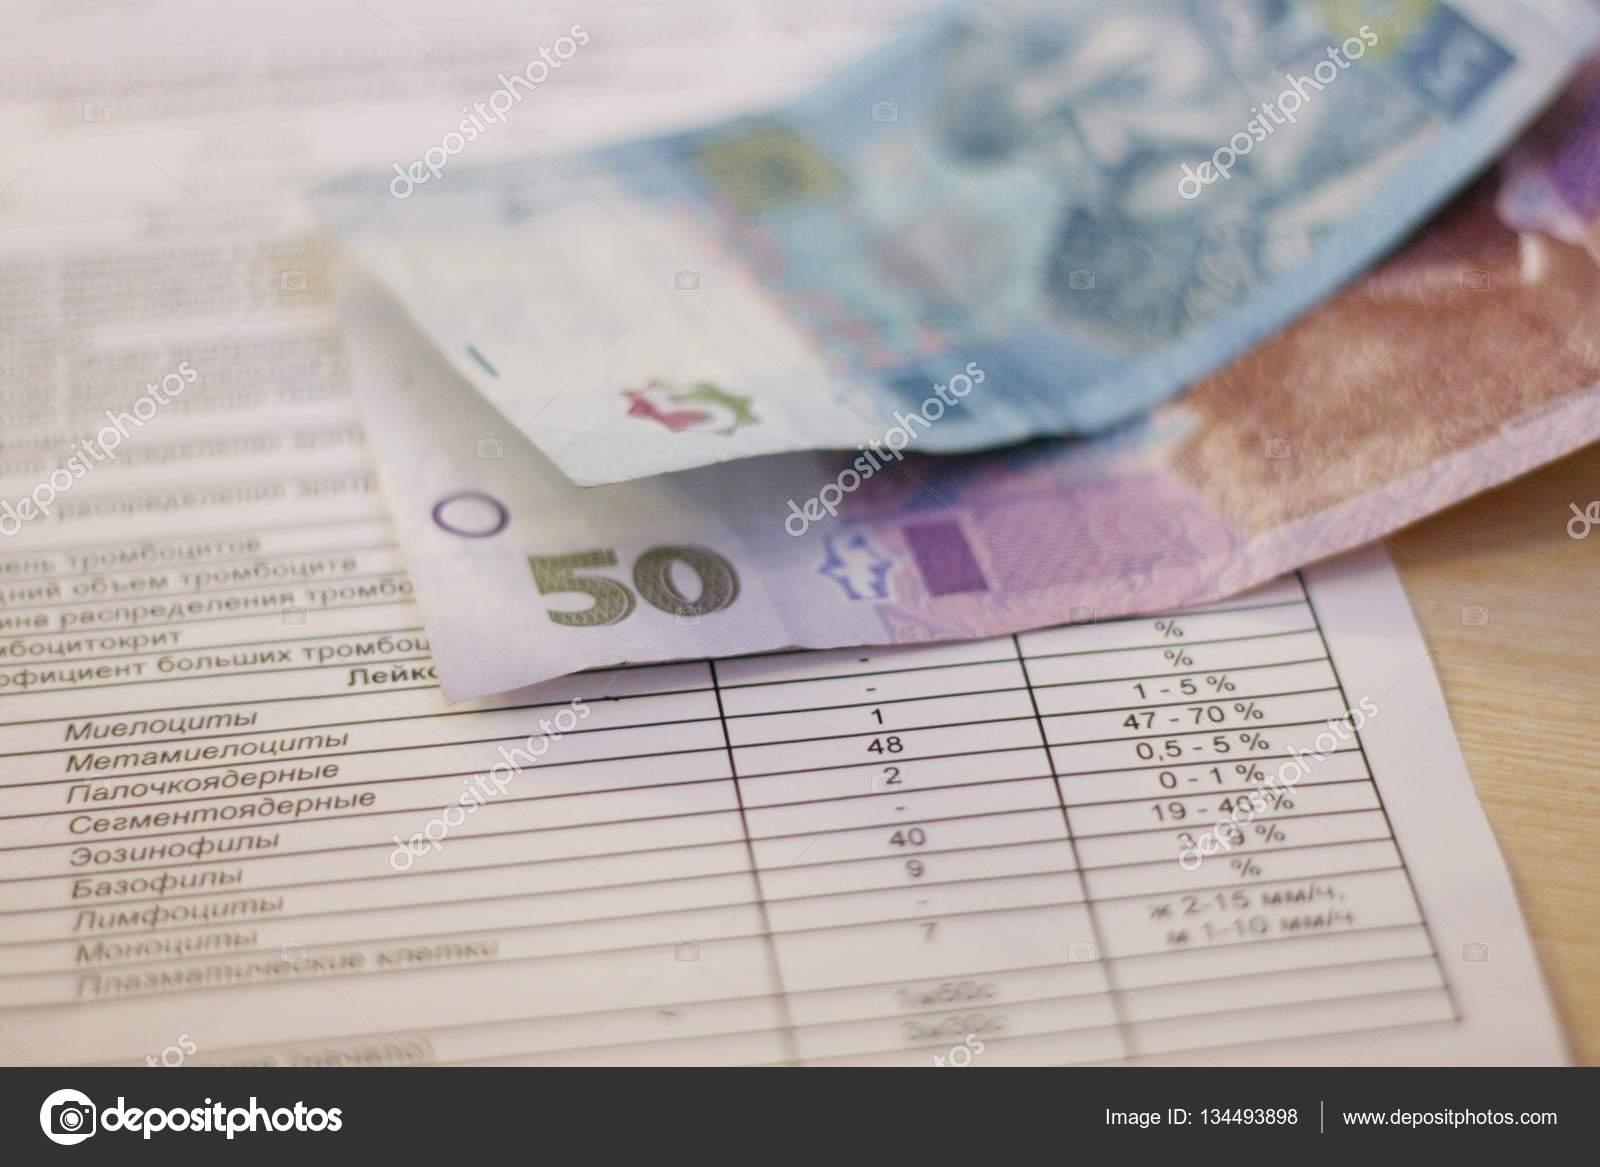 blood test for 3 dollars, ukraine анализ крови за 55 грн